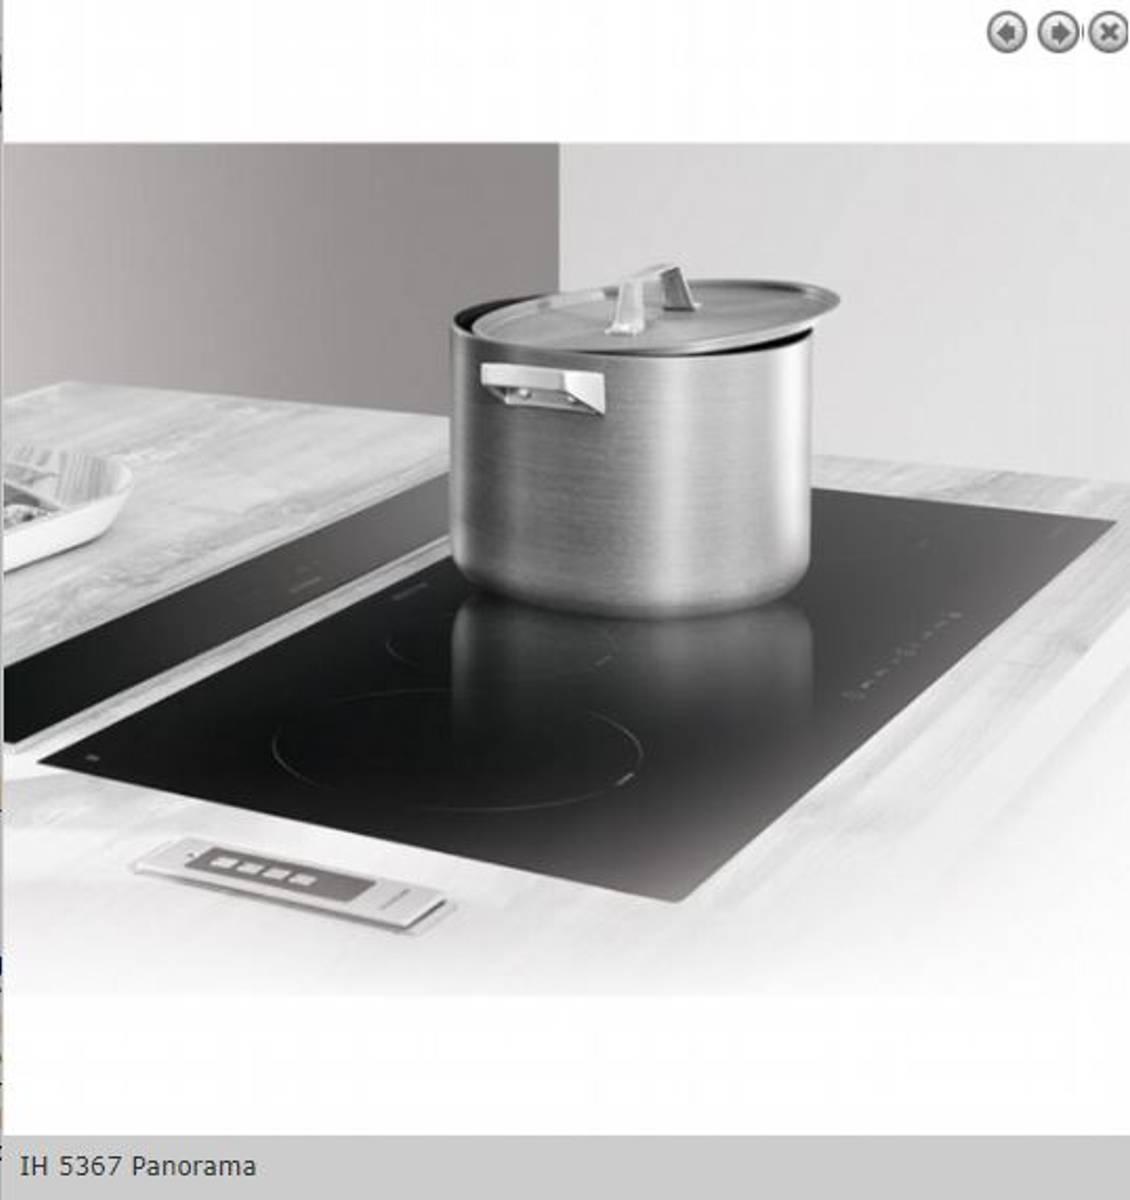 Silverline induksjon platetopp 90 cm svartPanoramaIH 5367